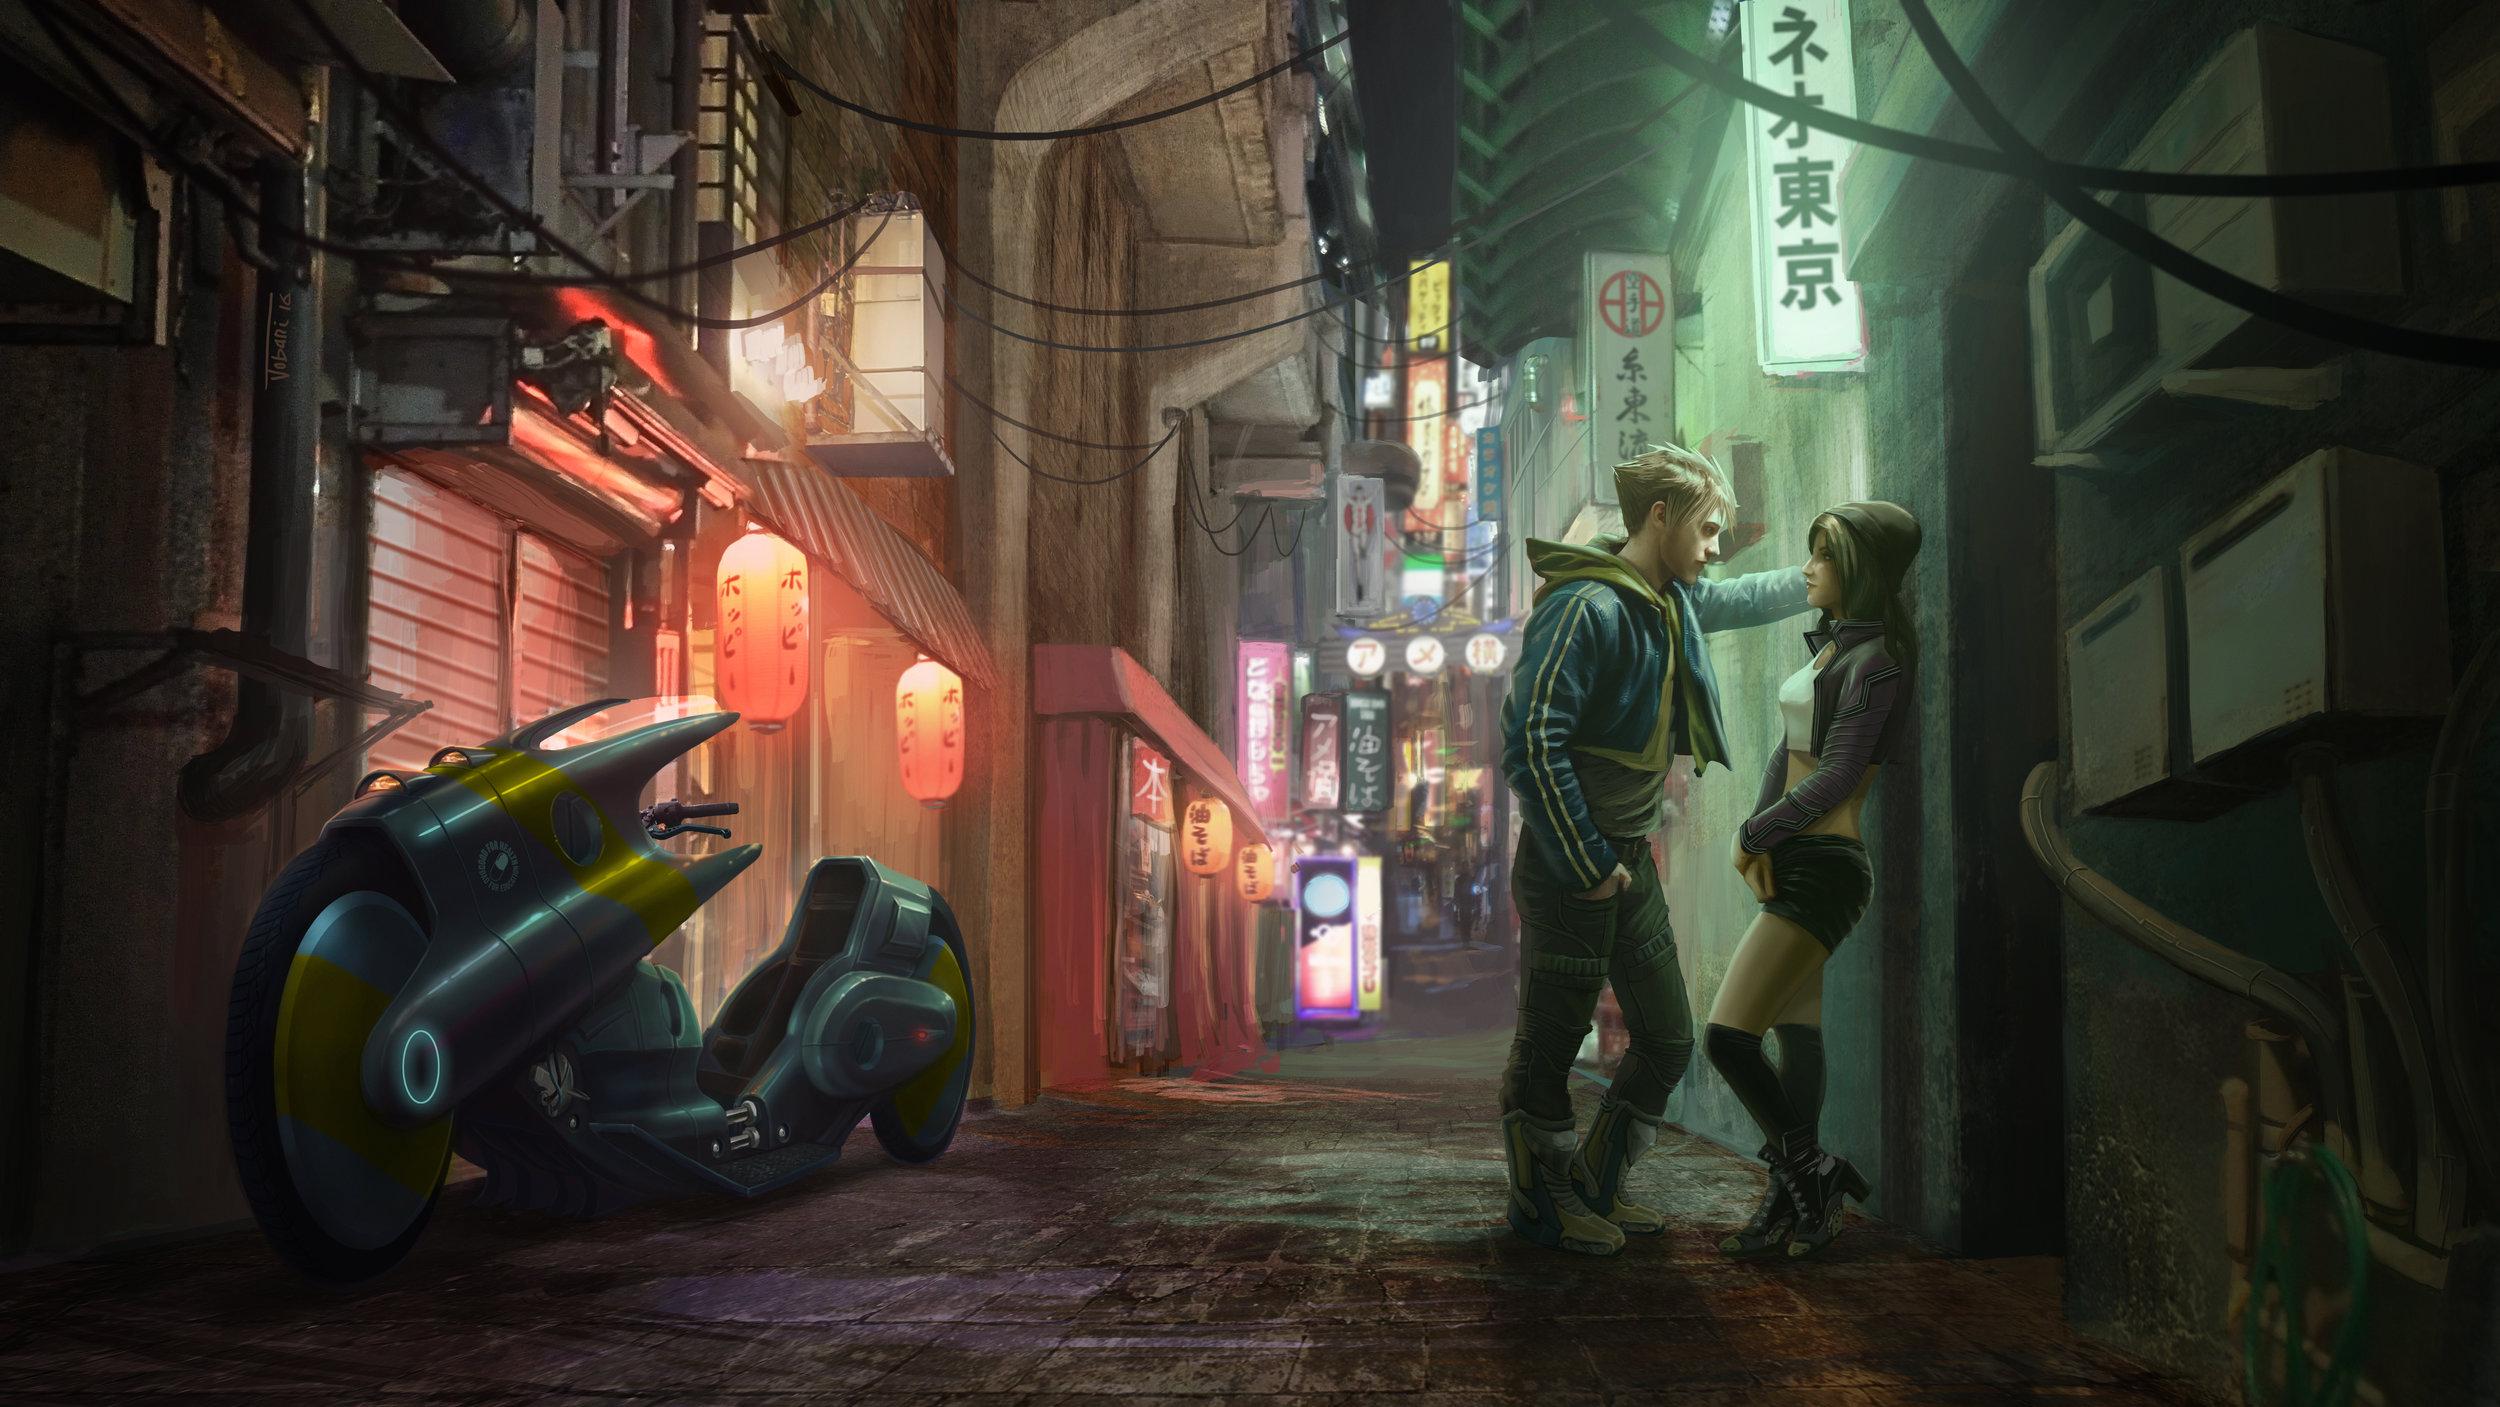 Neo Tokyo by  Carlos Jobani.    https://rikud0k0.deviantart.com/